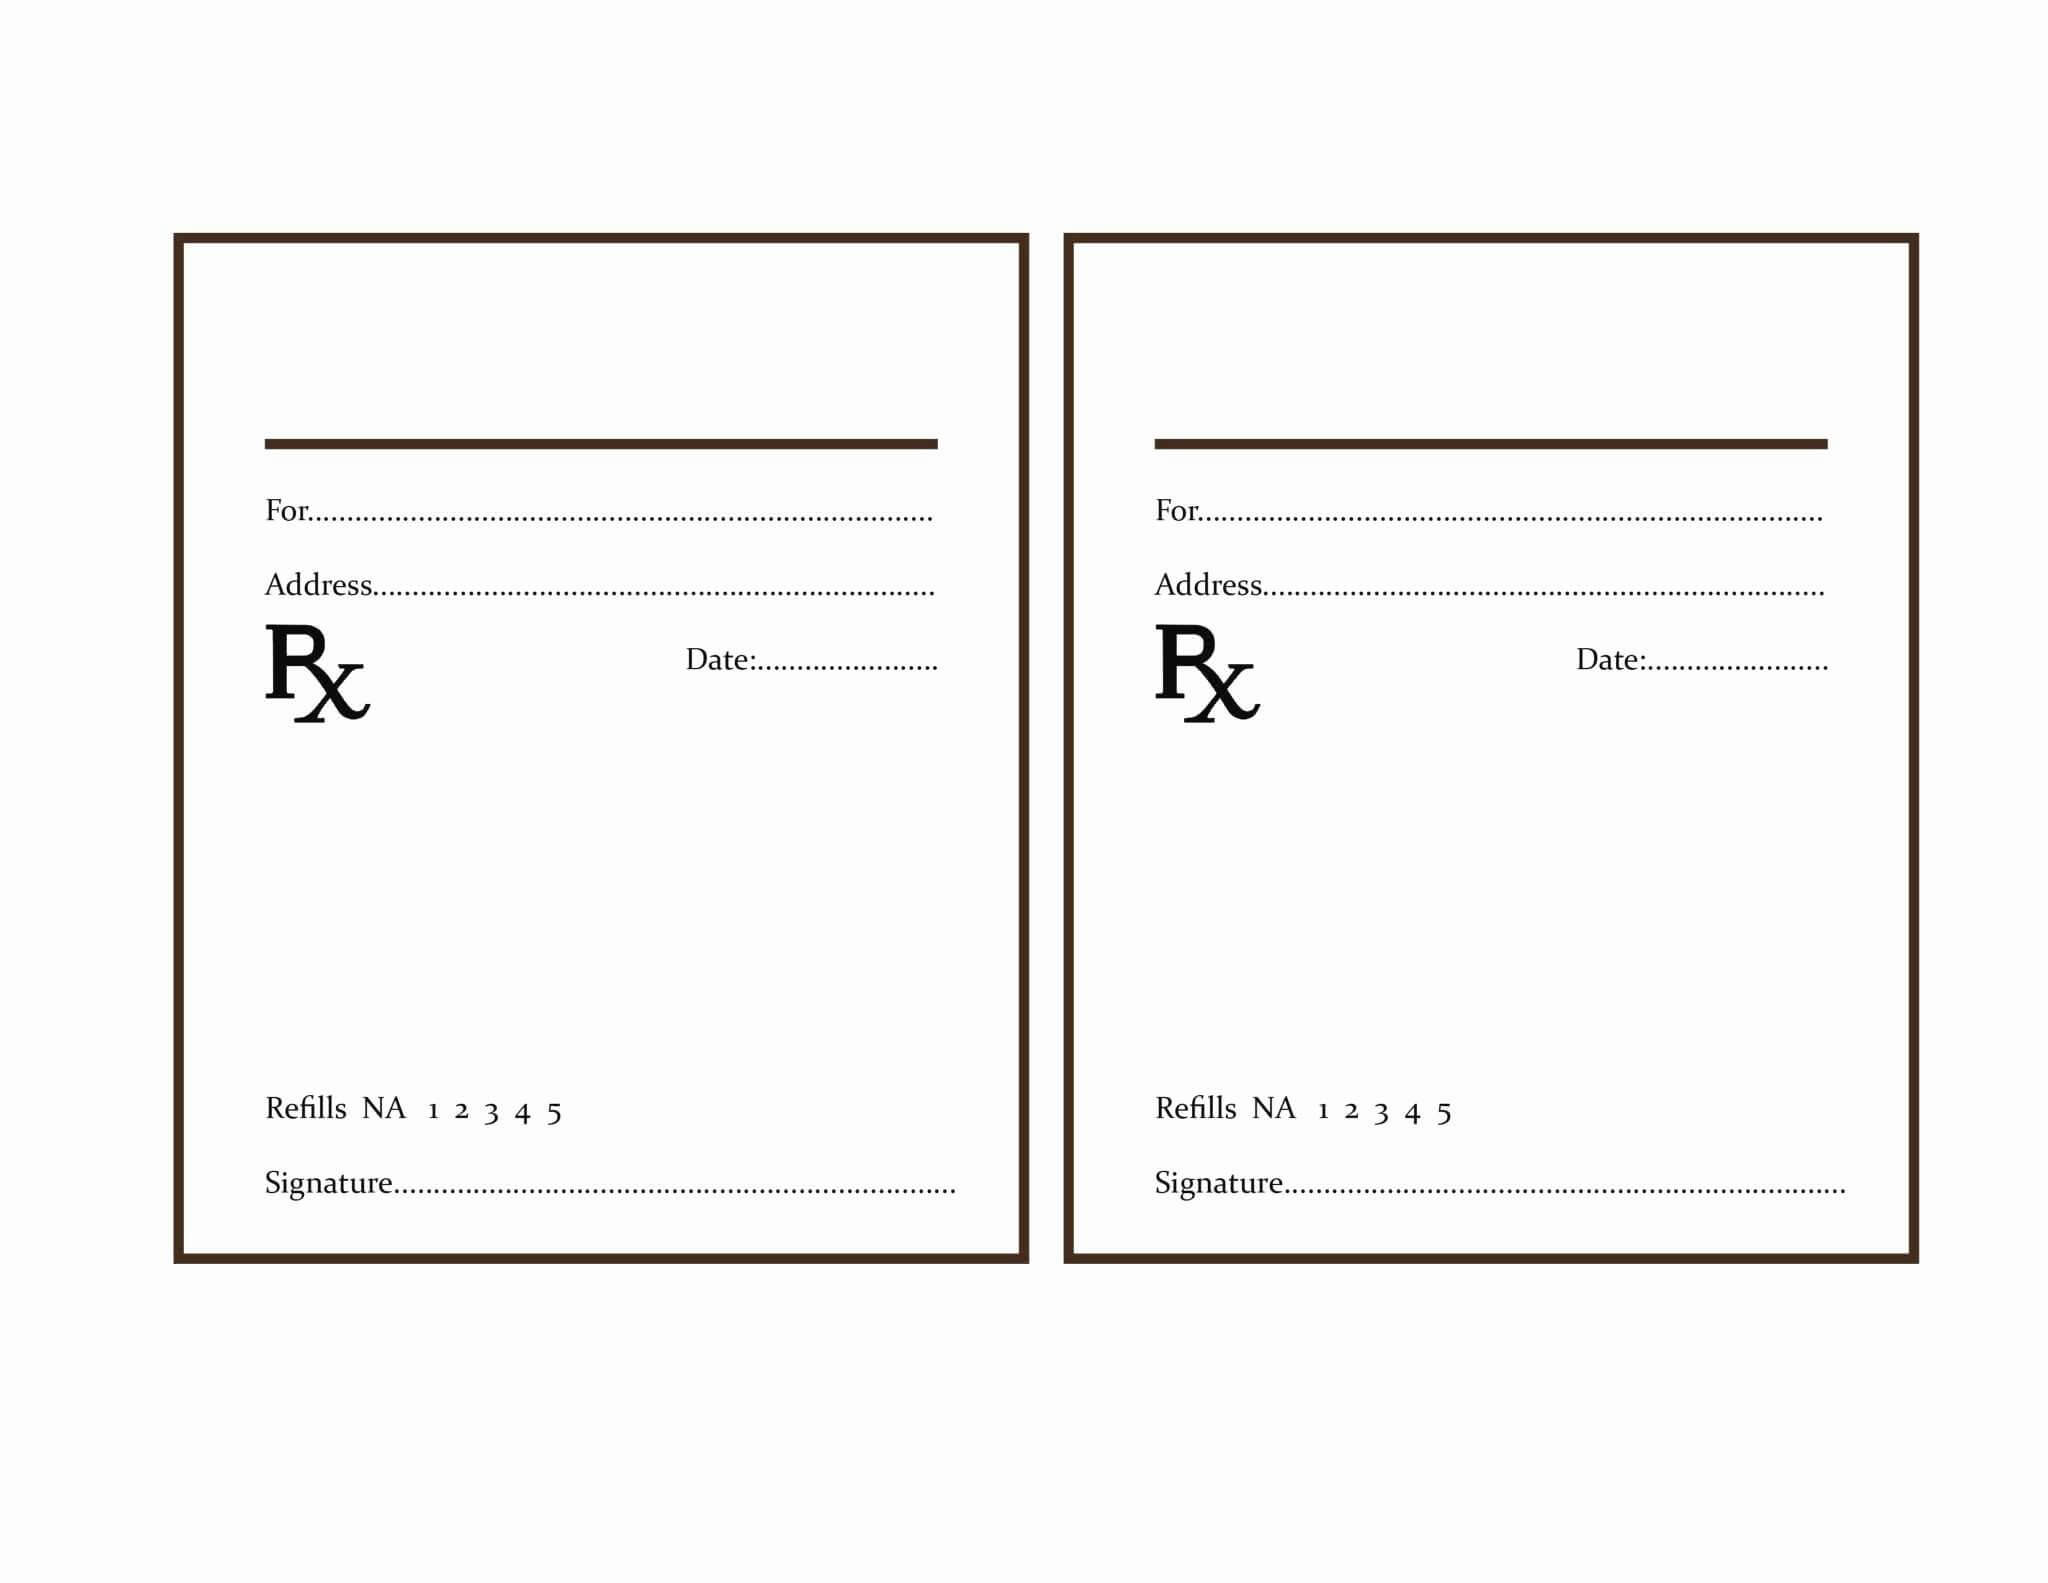 013 Fake Prescription Label Template Modern Design With with Blank Prescription Pad Template